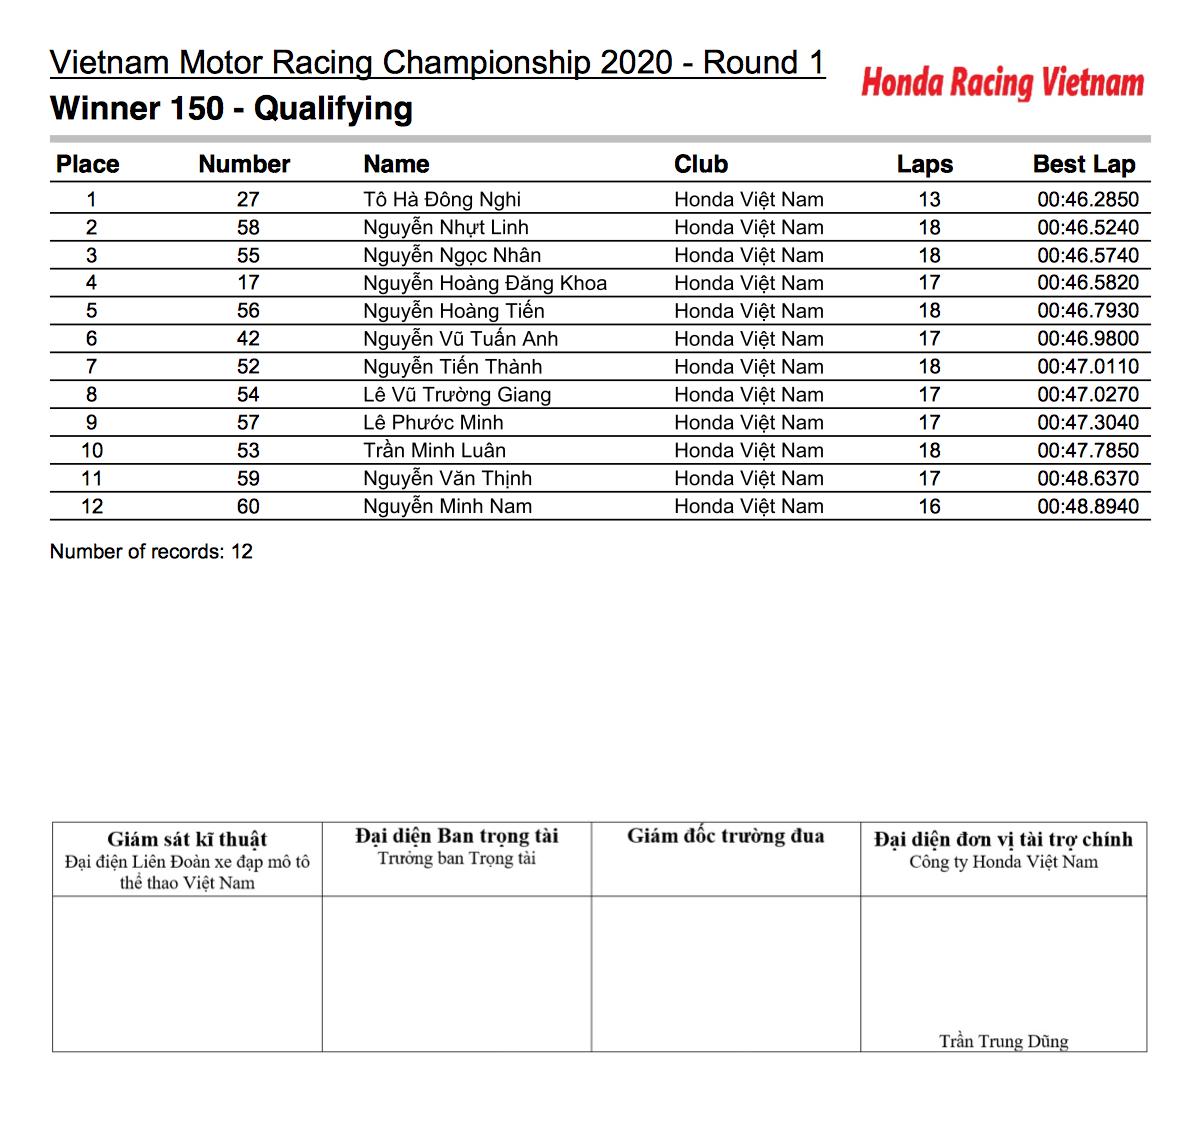 winner-150-qualifying.png